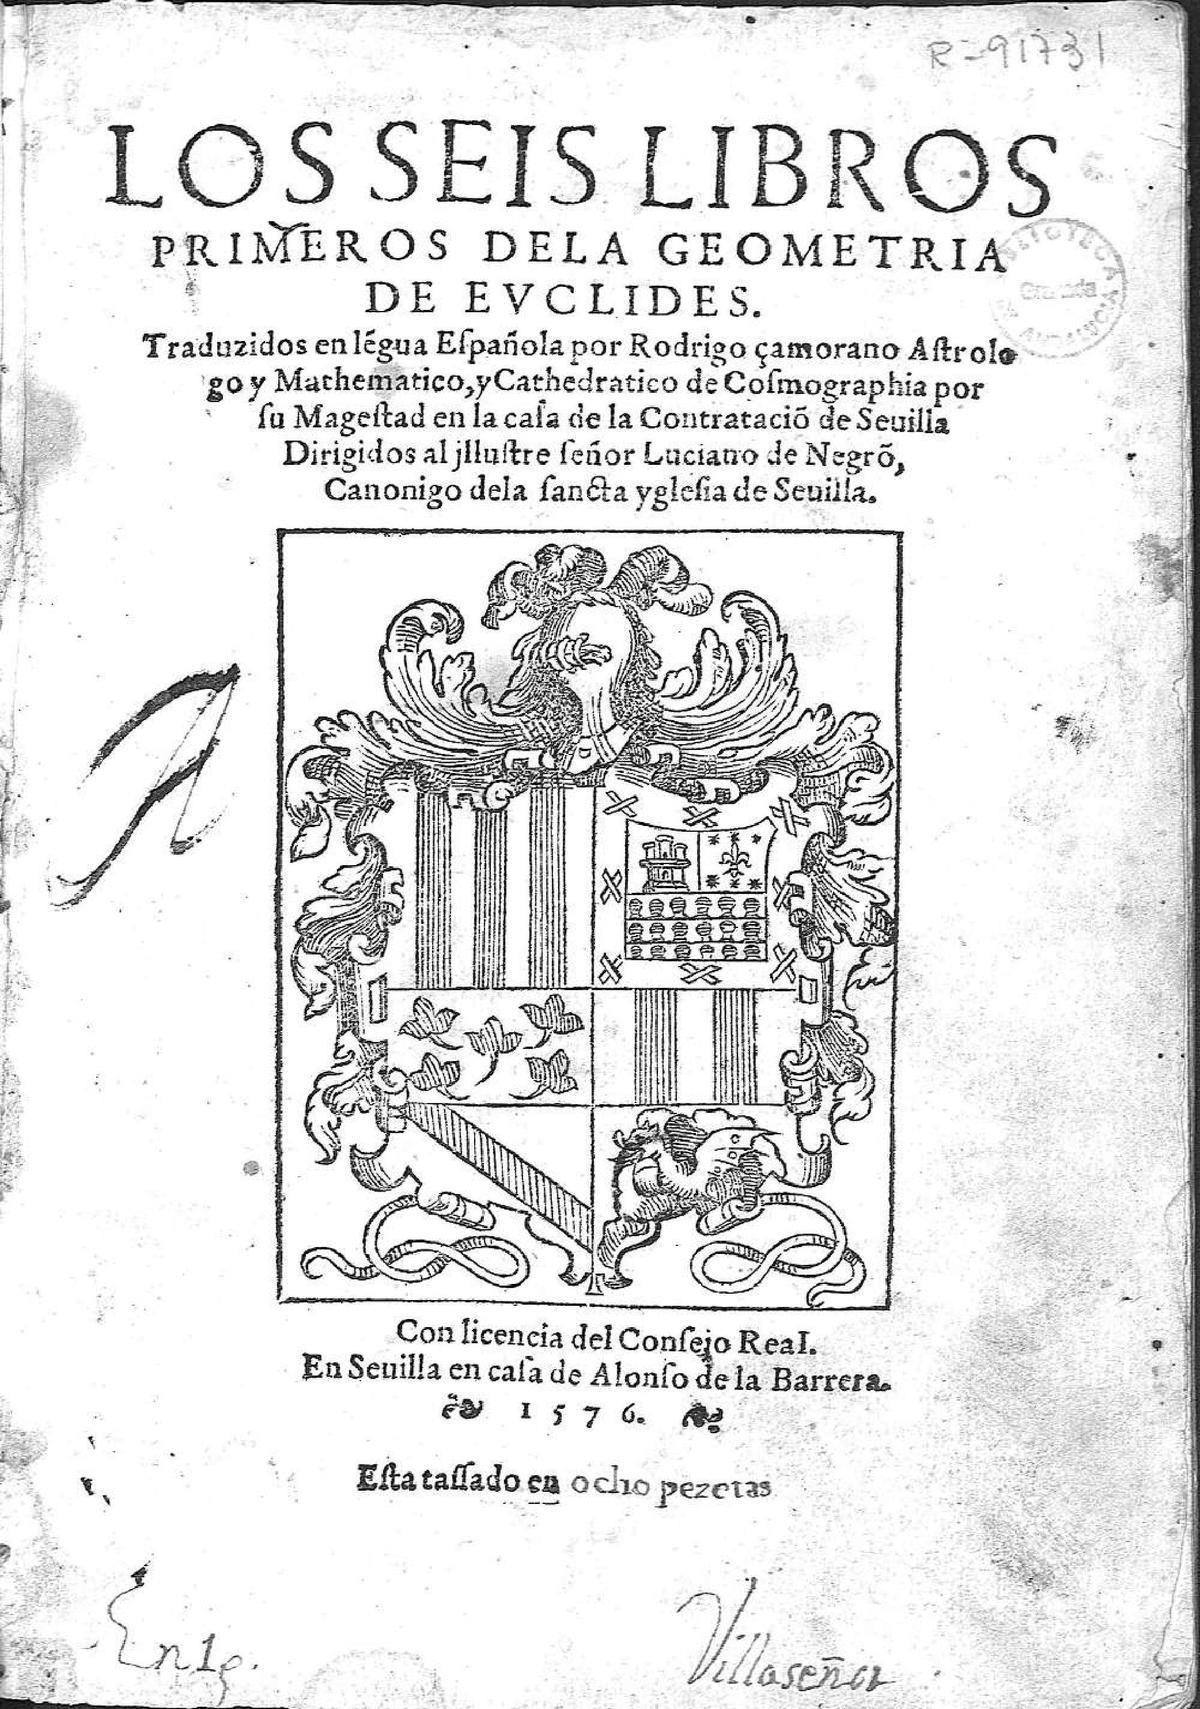 Elementos de Euclides - Wikipedia, la enciclopedia libre